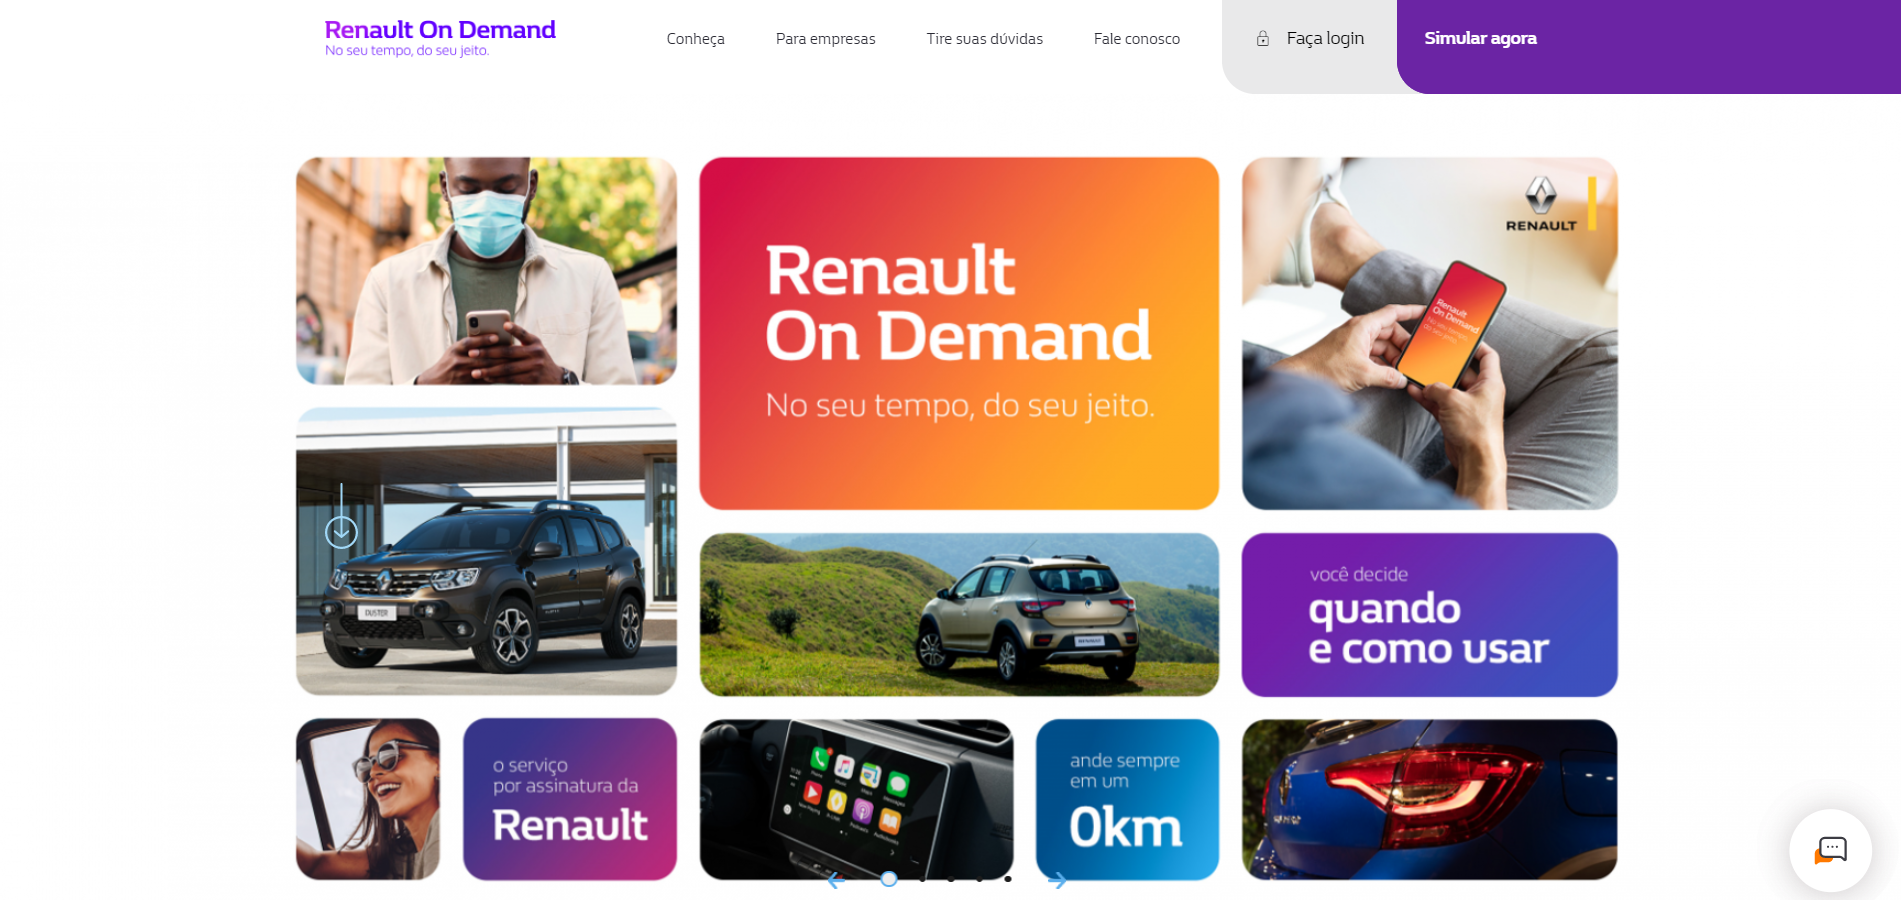 renault on demand alugar carro